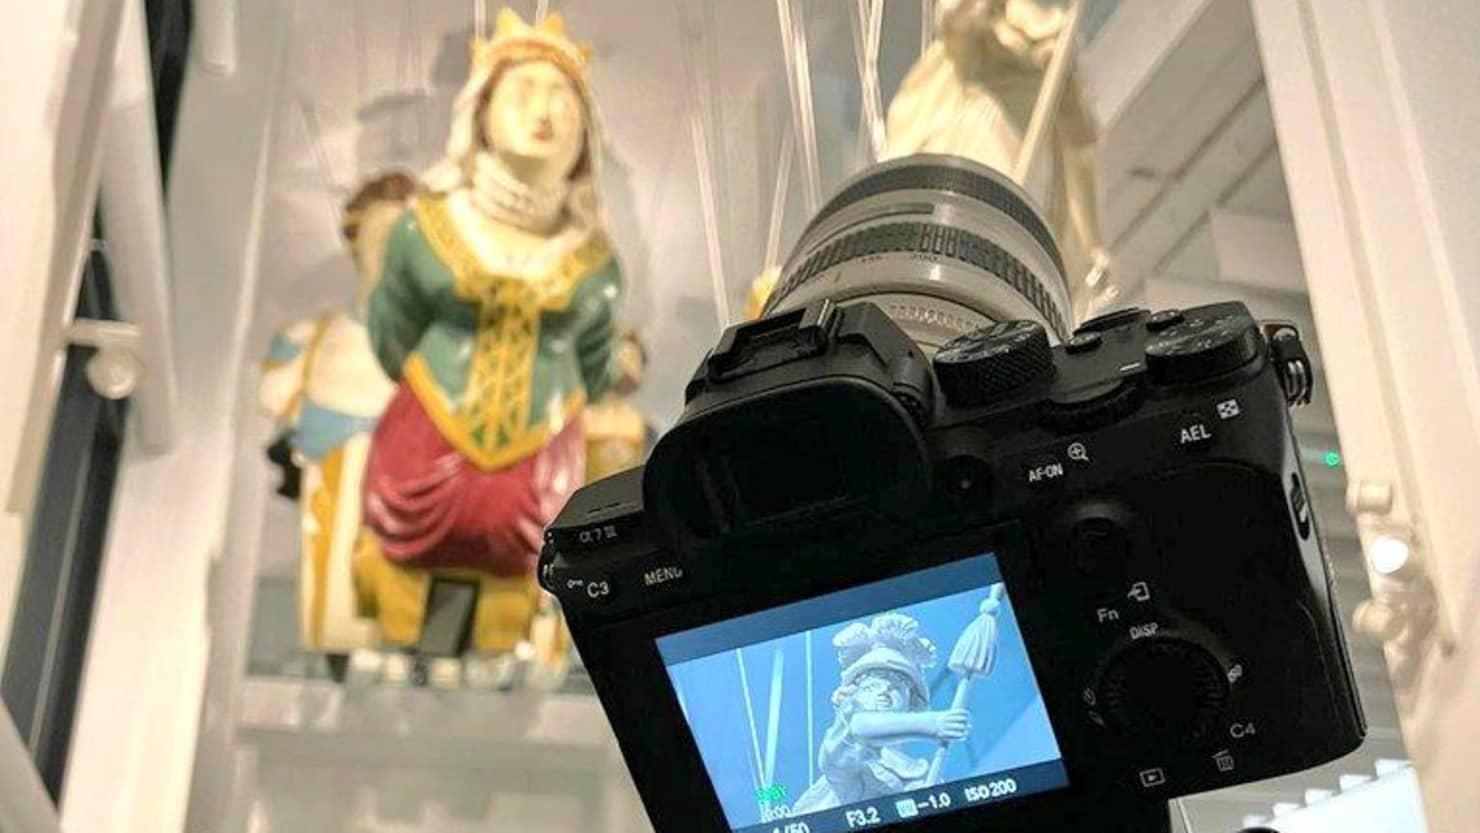 Camera capturing image of figureheads